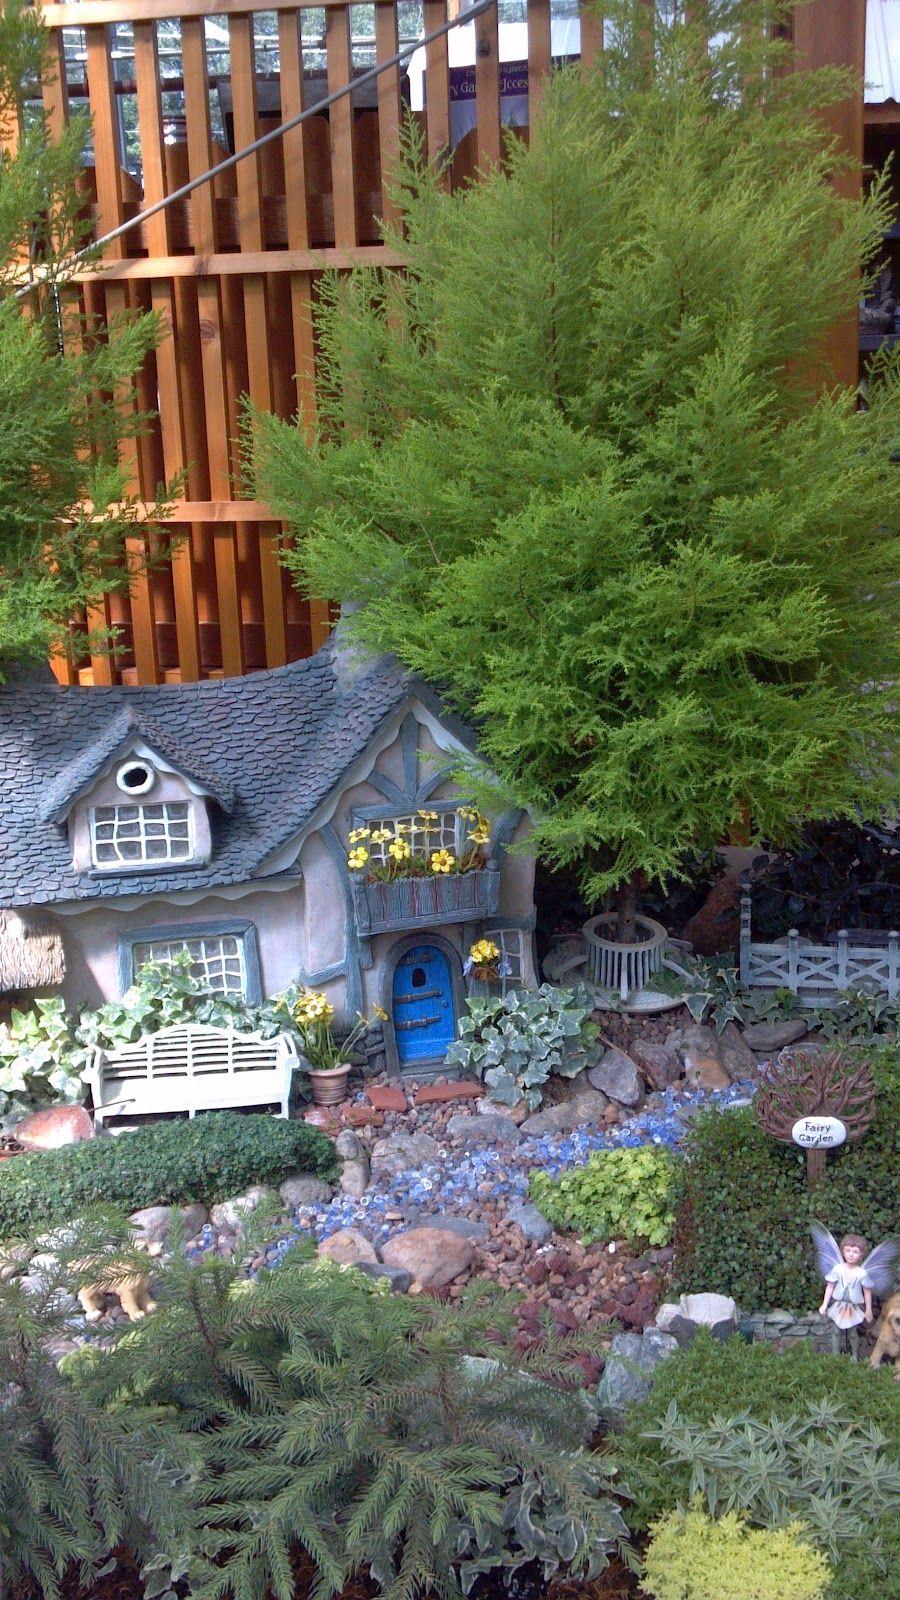 Landscape of house garden  Pin by Joyce Knight on garden ideas  Pinterest  Gardens and Garden